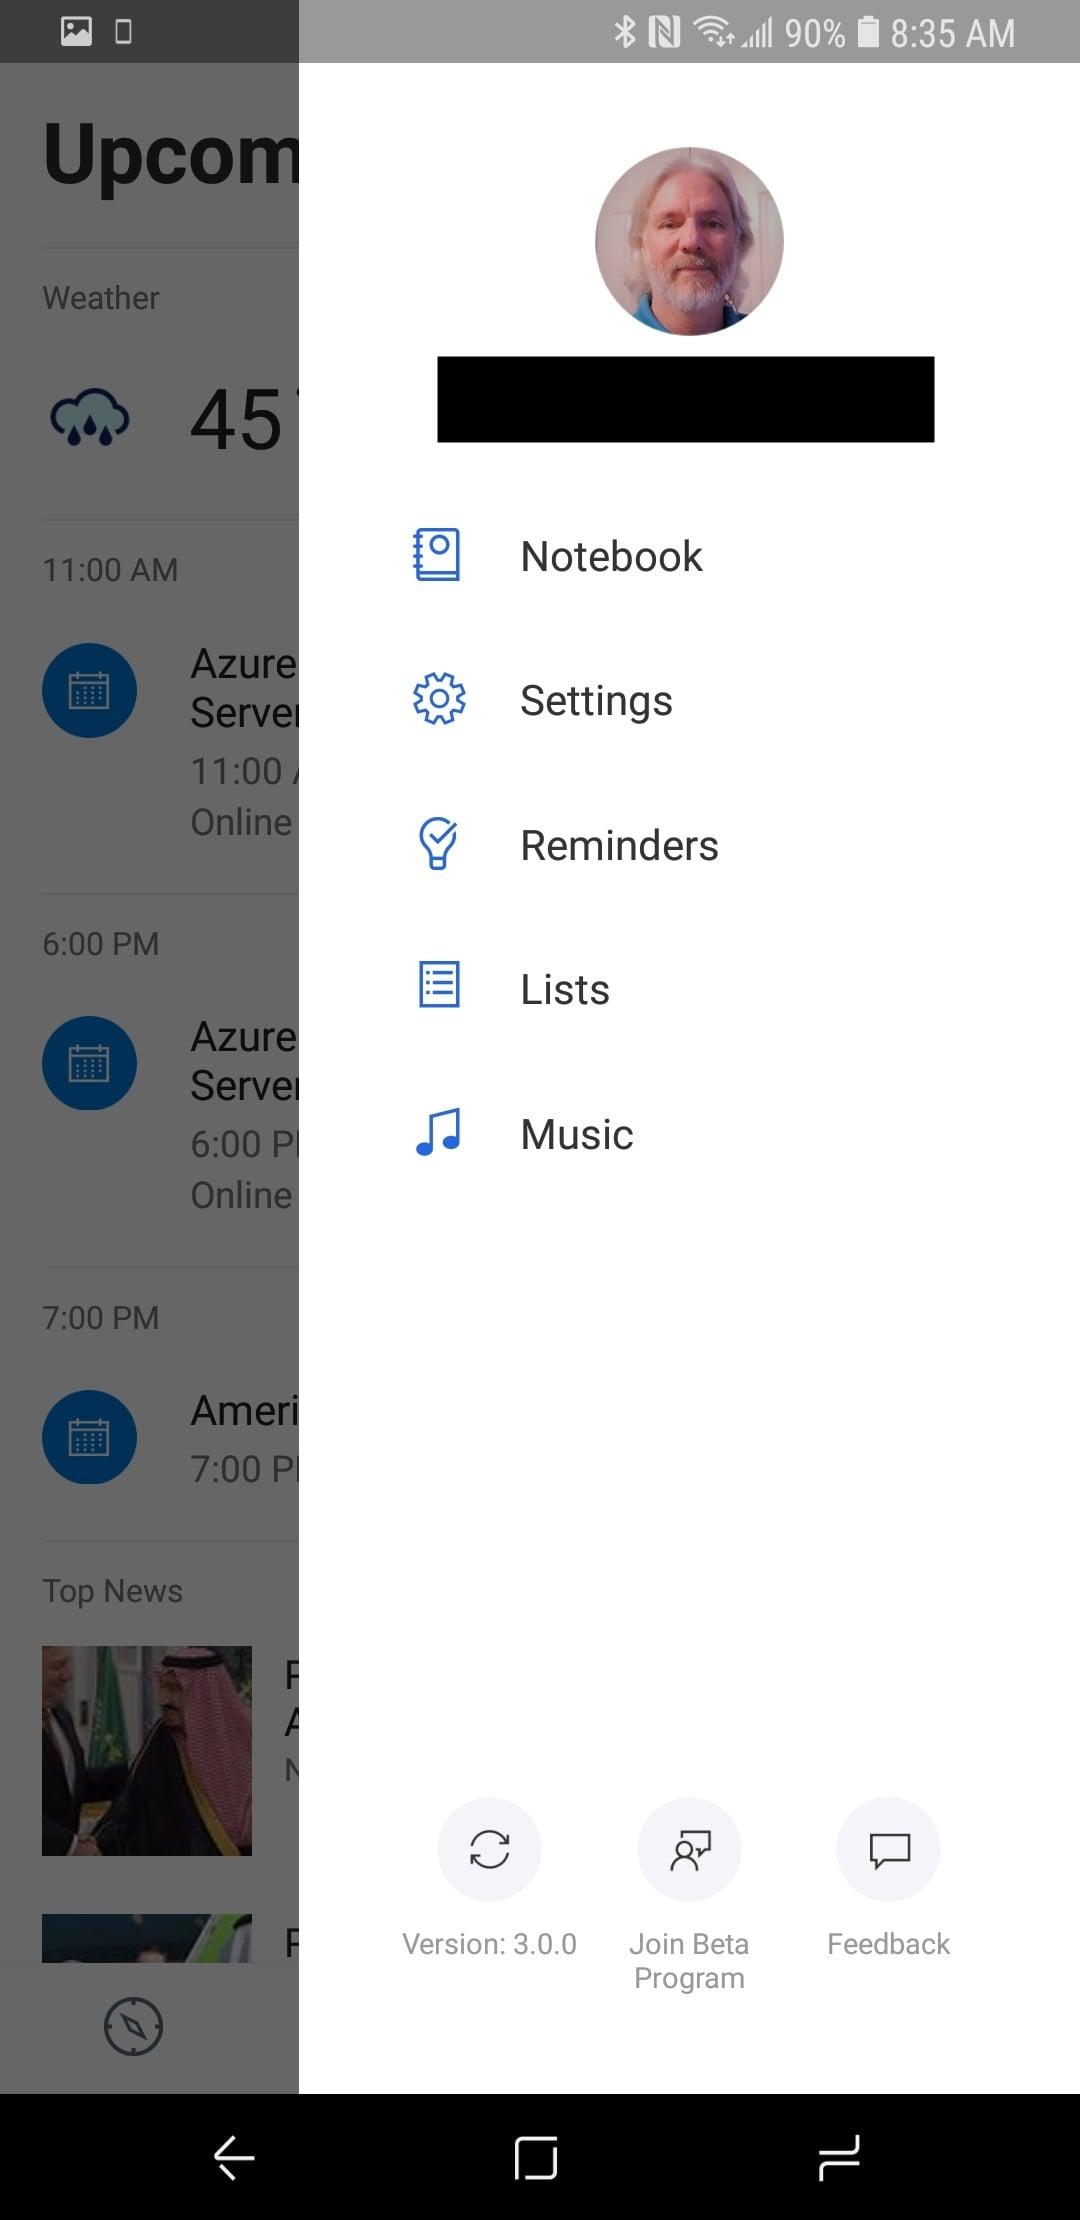 Cortana App 3.0 on Android